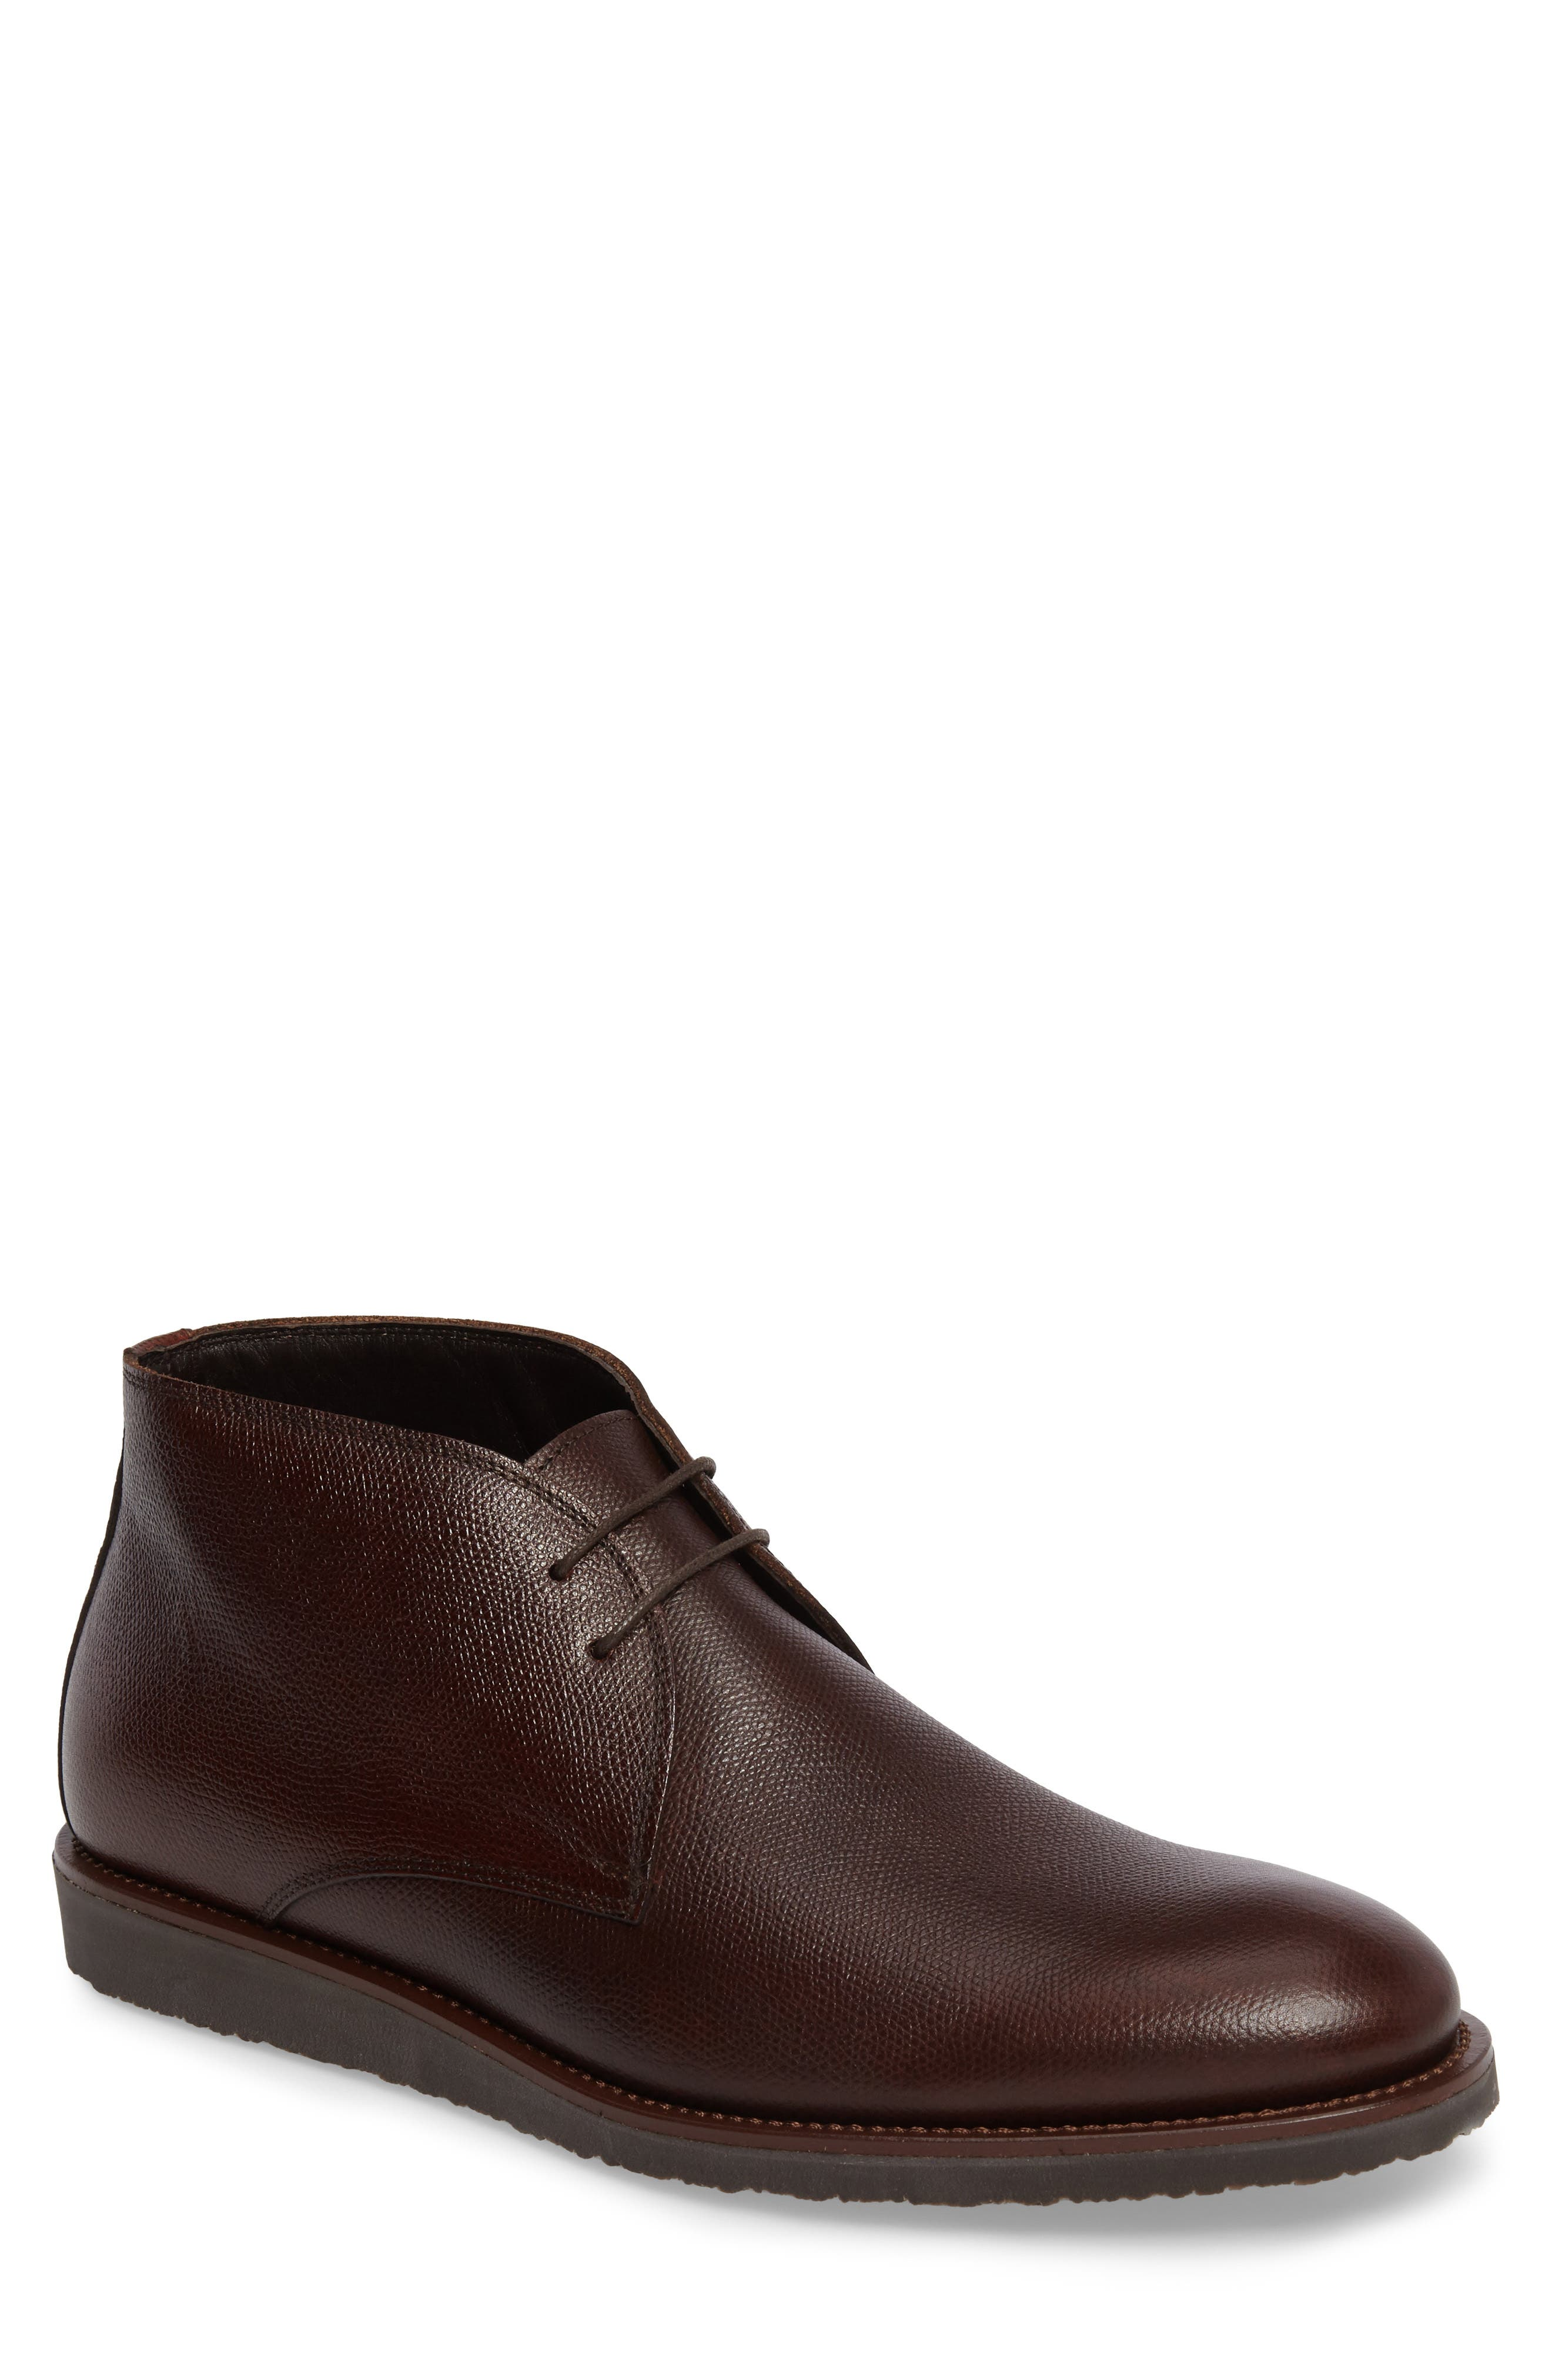 Main Image - To Boot New York Franklin Chukka Boot (Men)